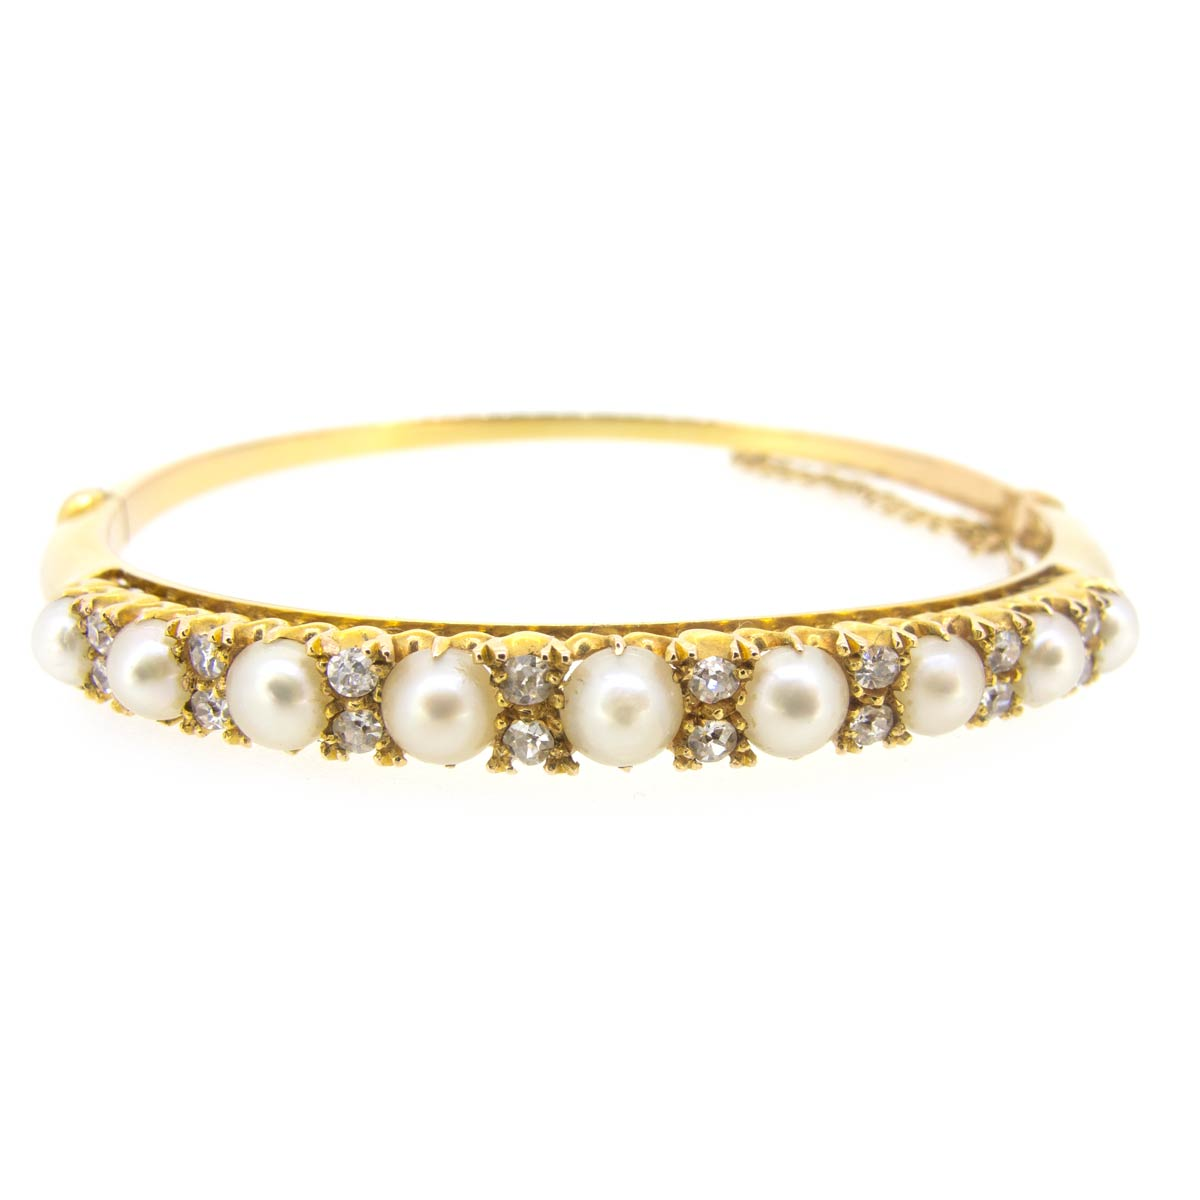 Antique Pearl & Diamond Bangle